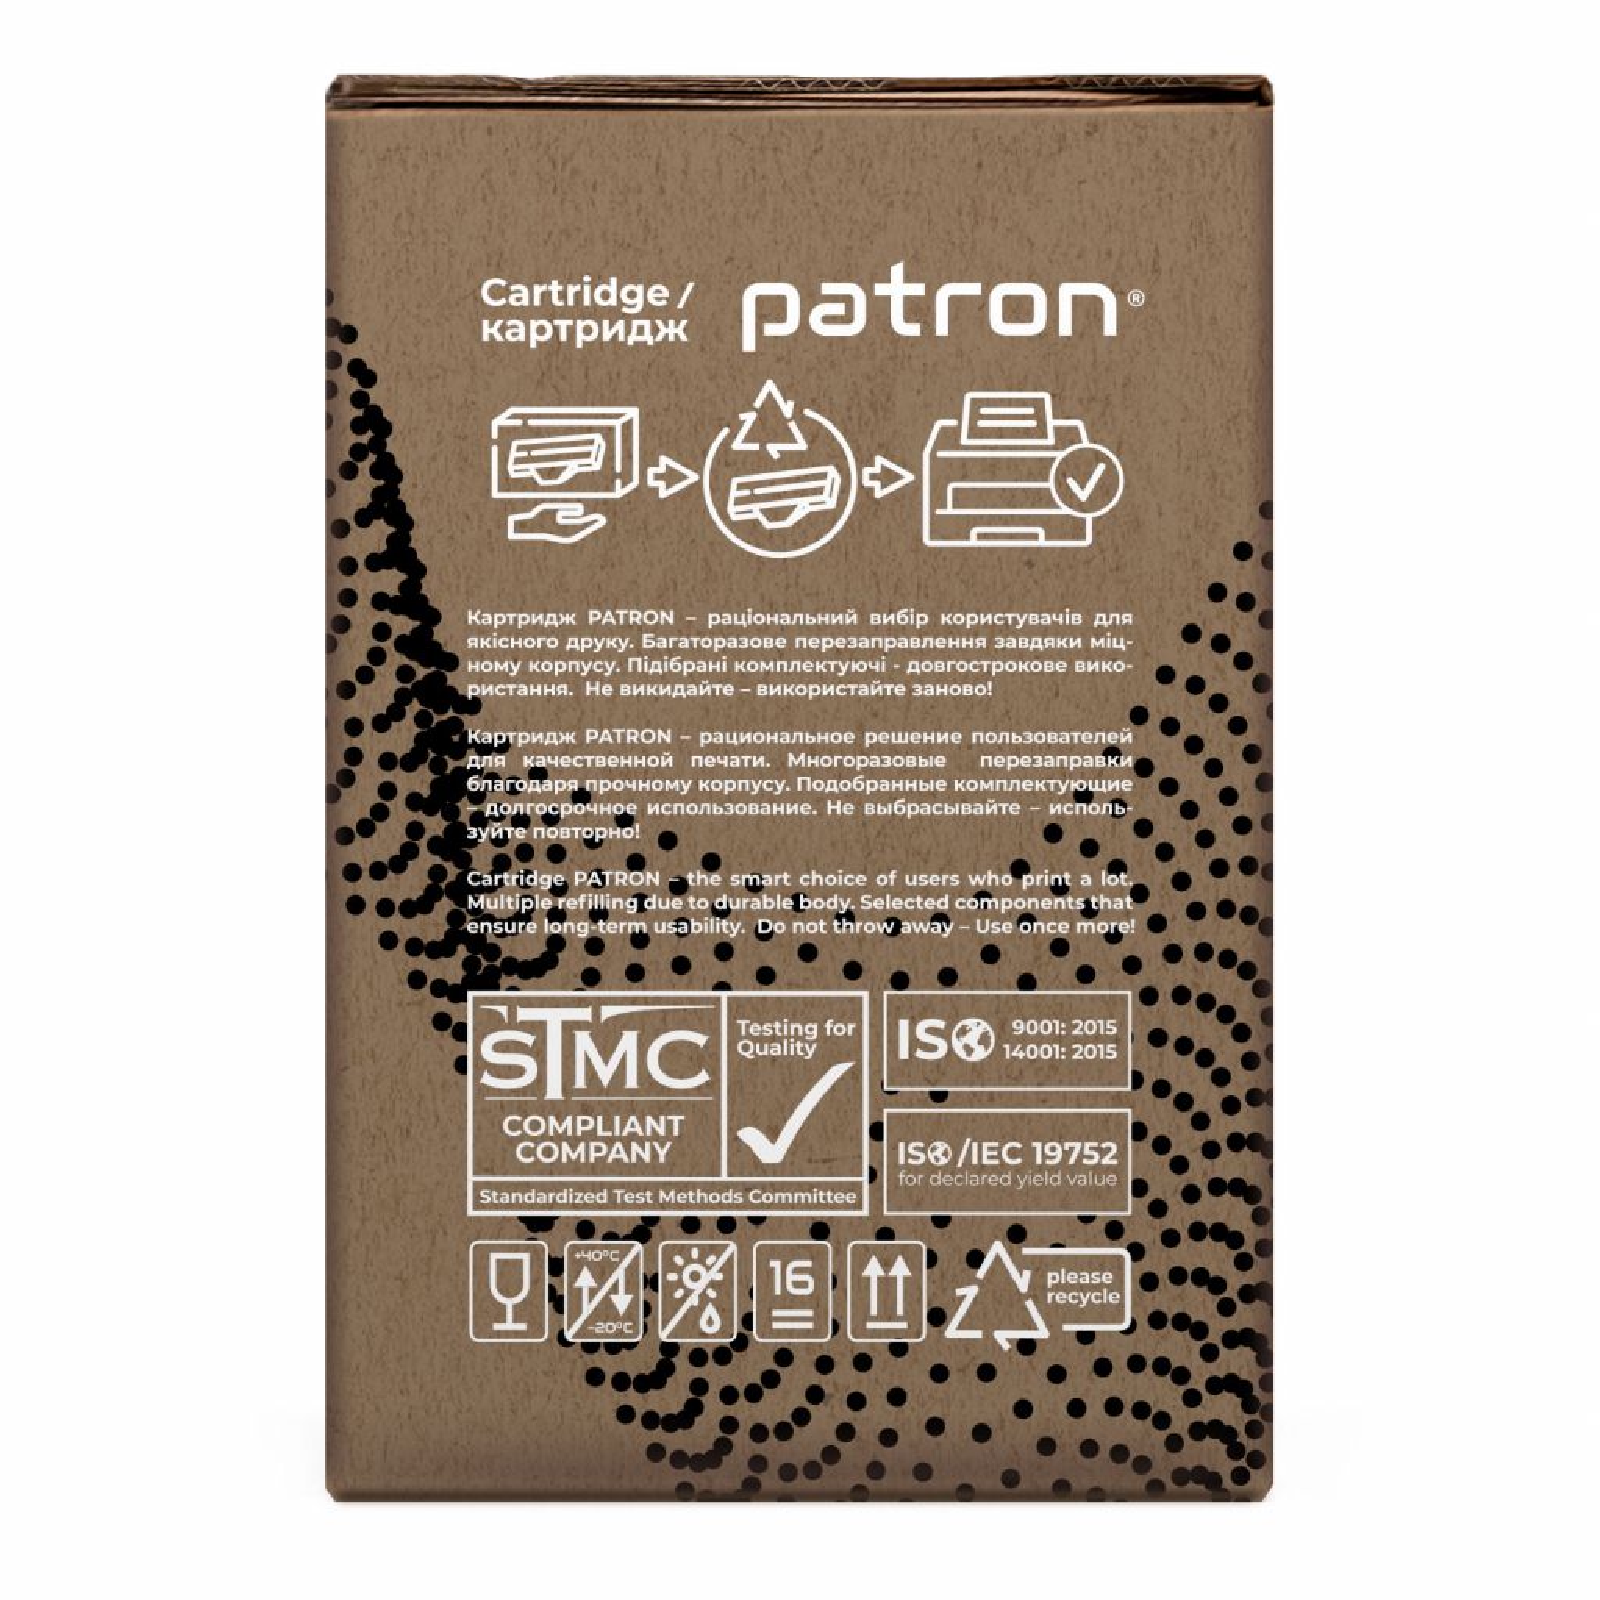 Картридж Patron SAMSUNG MLT-D104S GREEN Label (PN-D104GL) изображение 4